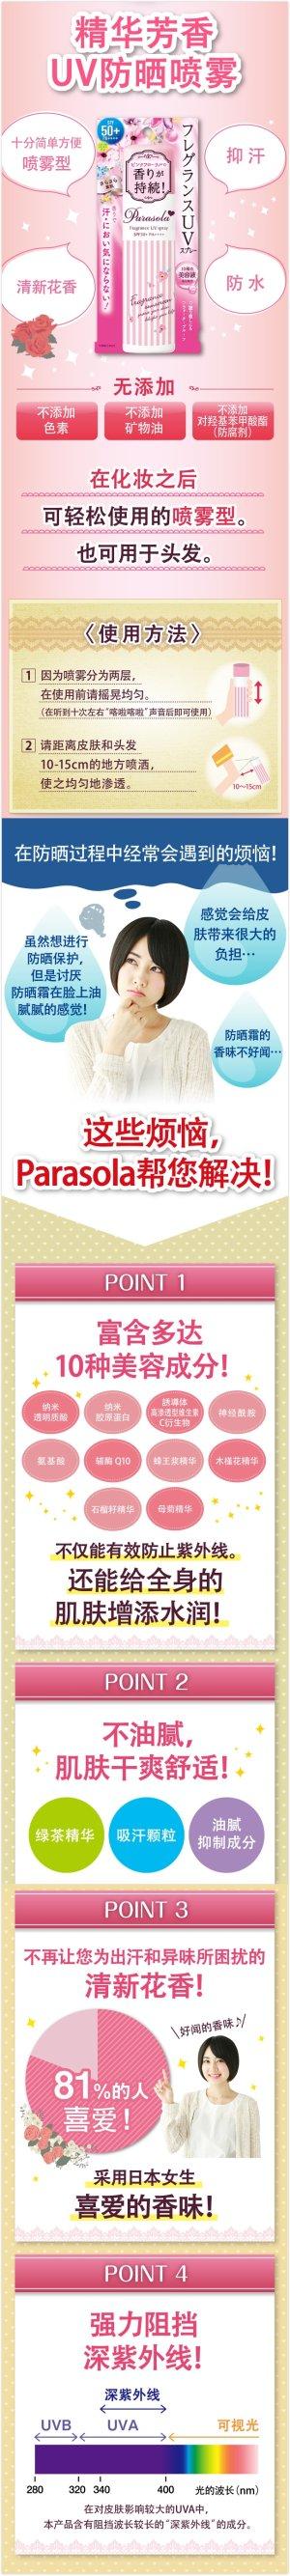 Naris Up Cosmetics Parasola Fragrance UV Care Spray SPF50+ PA++++